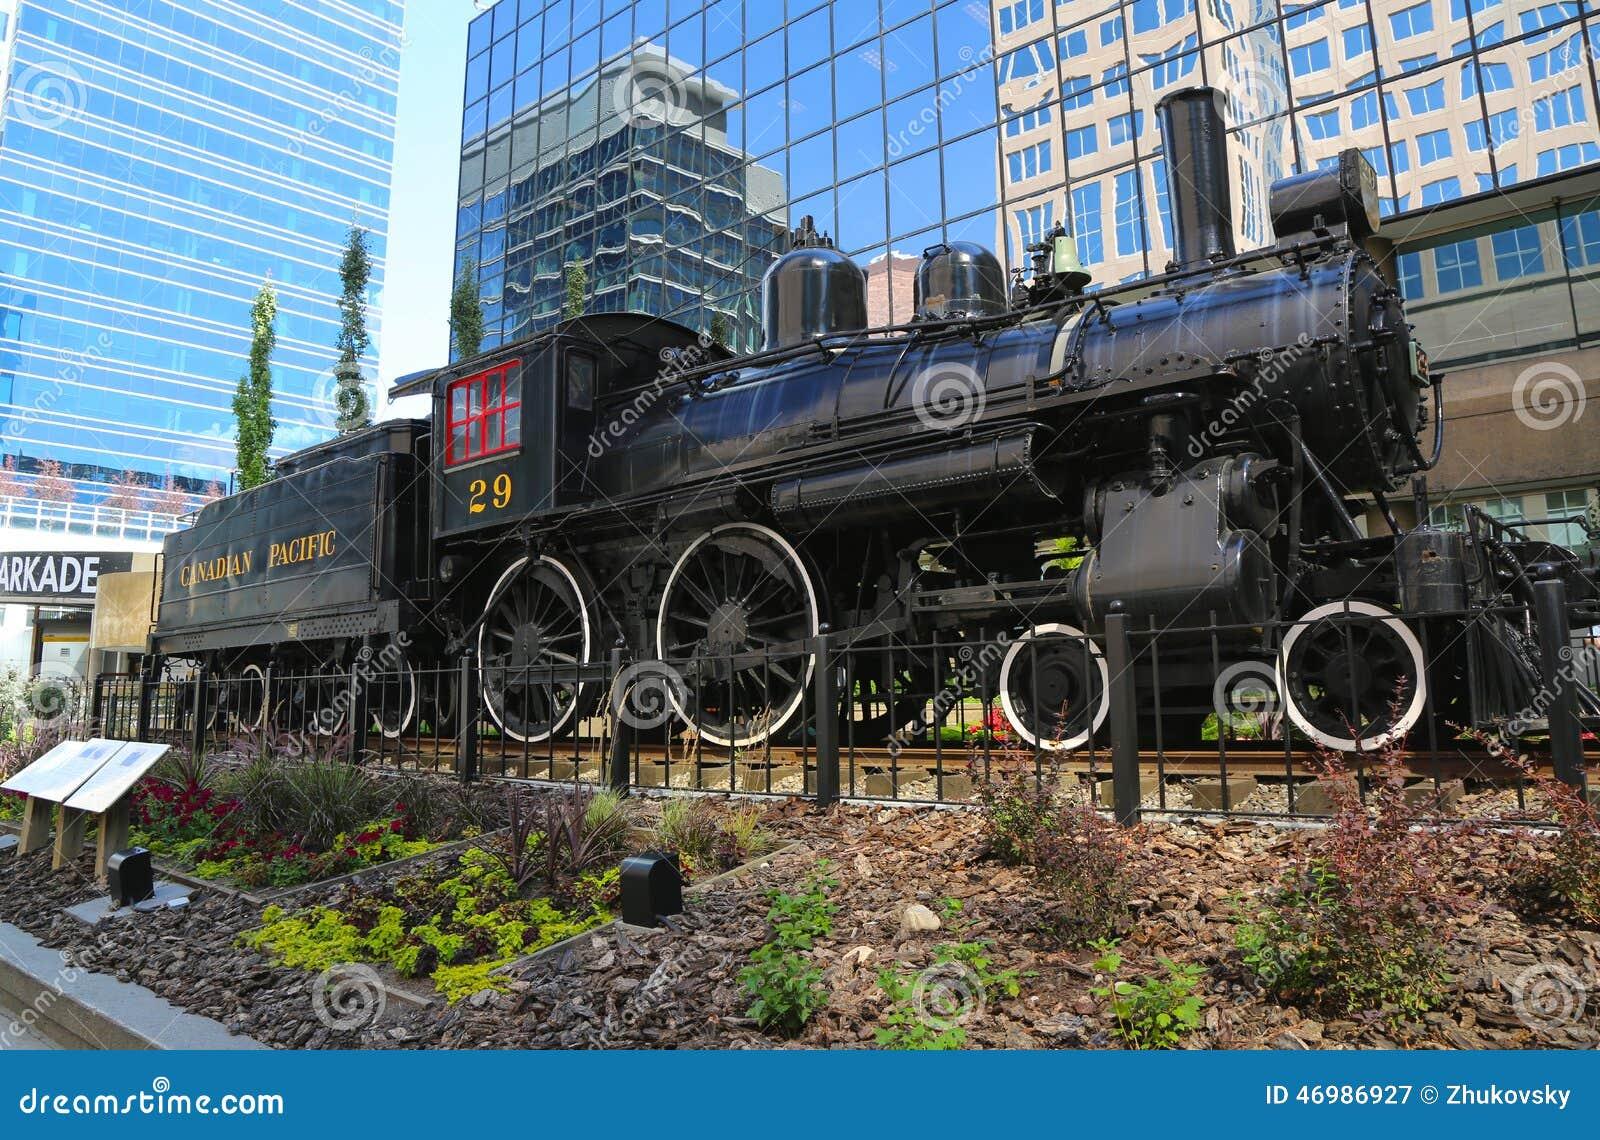 CALGARY, CANADA - JULY 29: Canadian Pacific Railway Locomotive 29 on ...